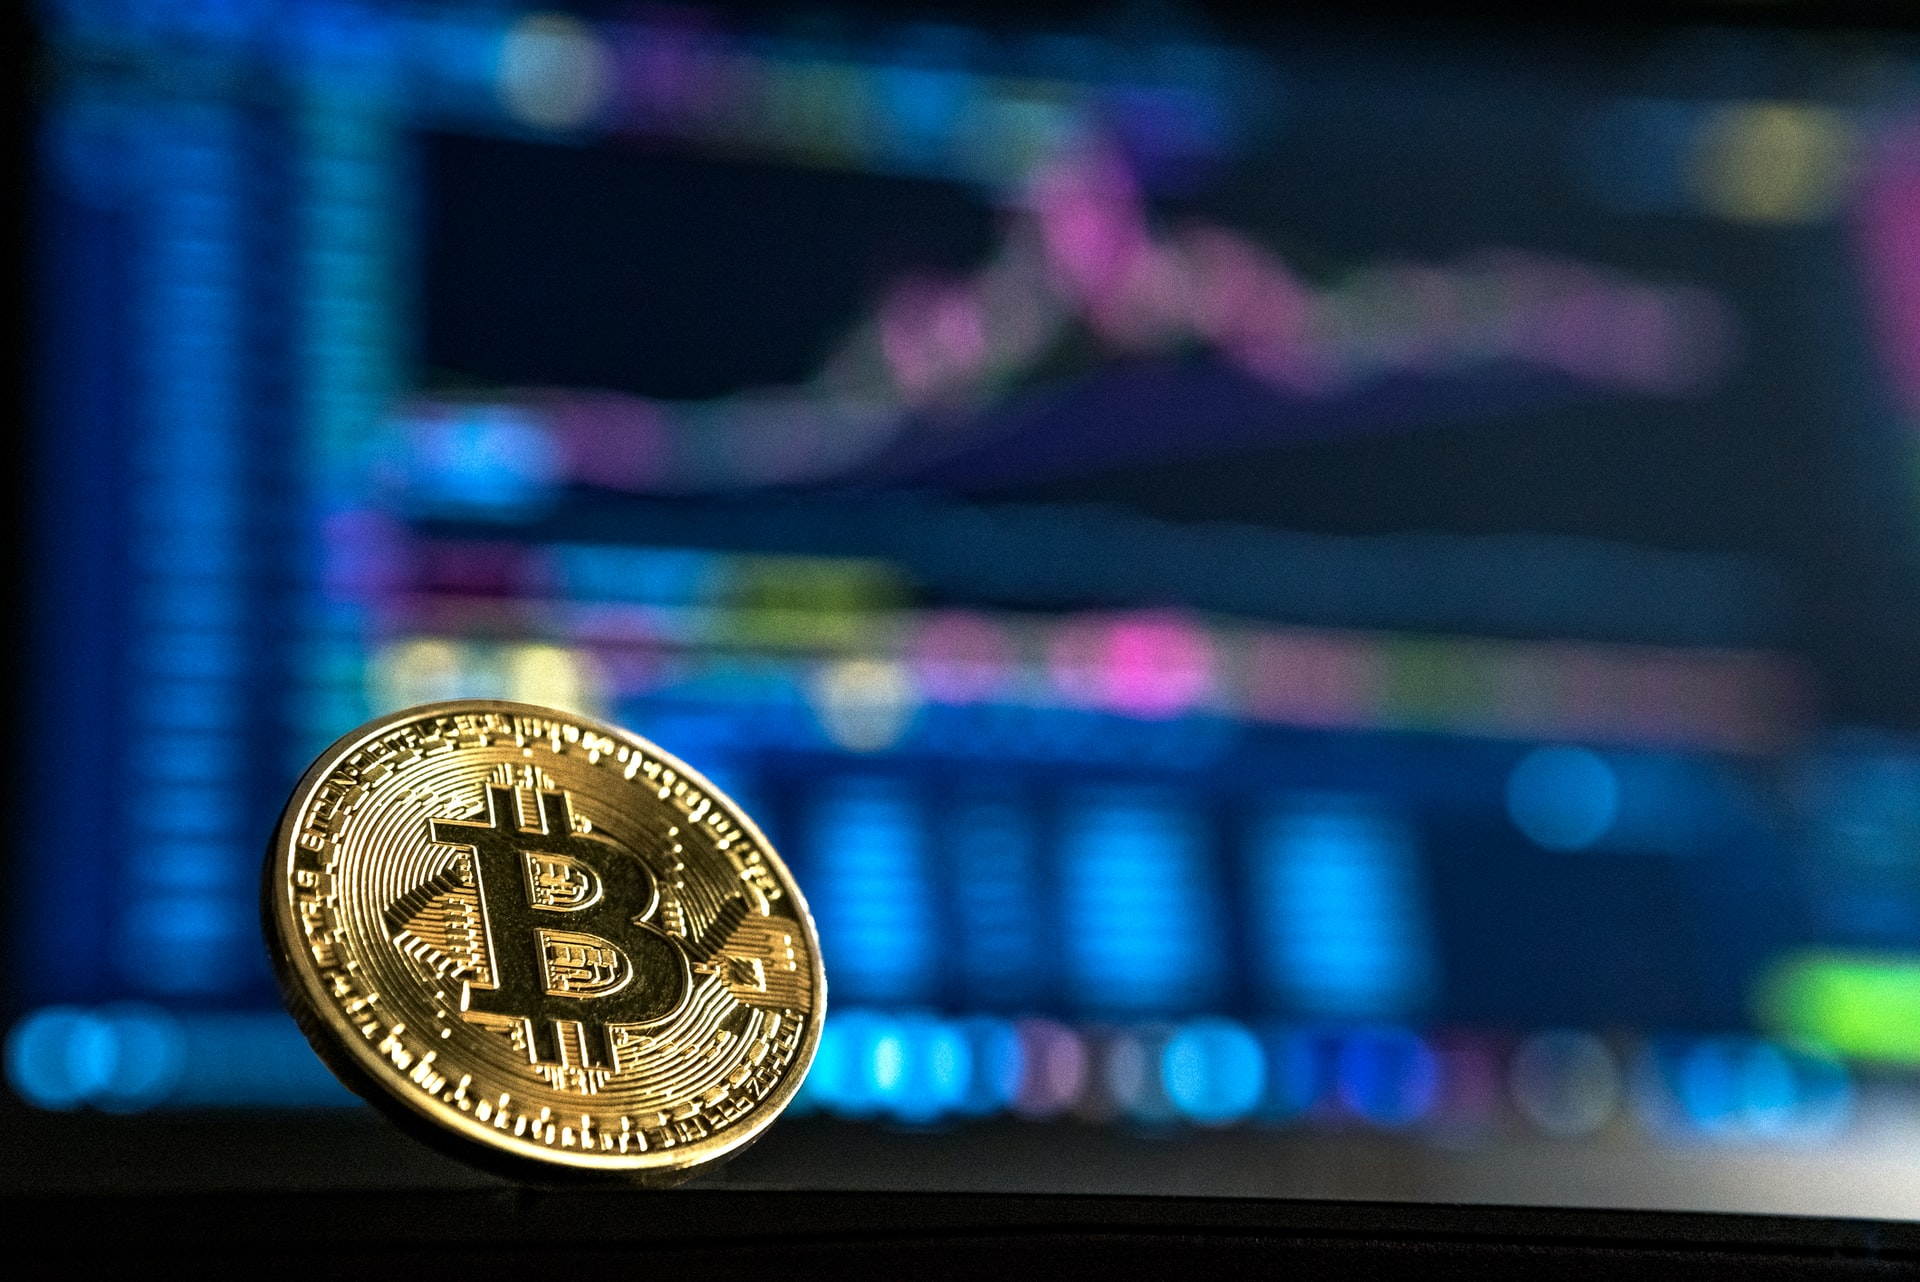 Biden Crypto Law Header Image